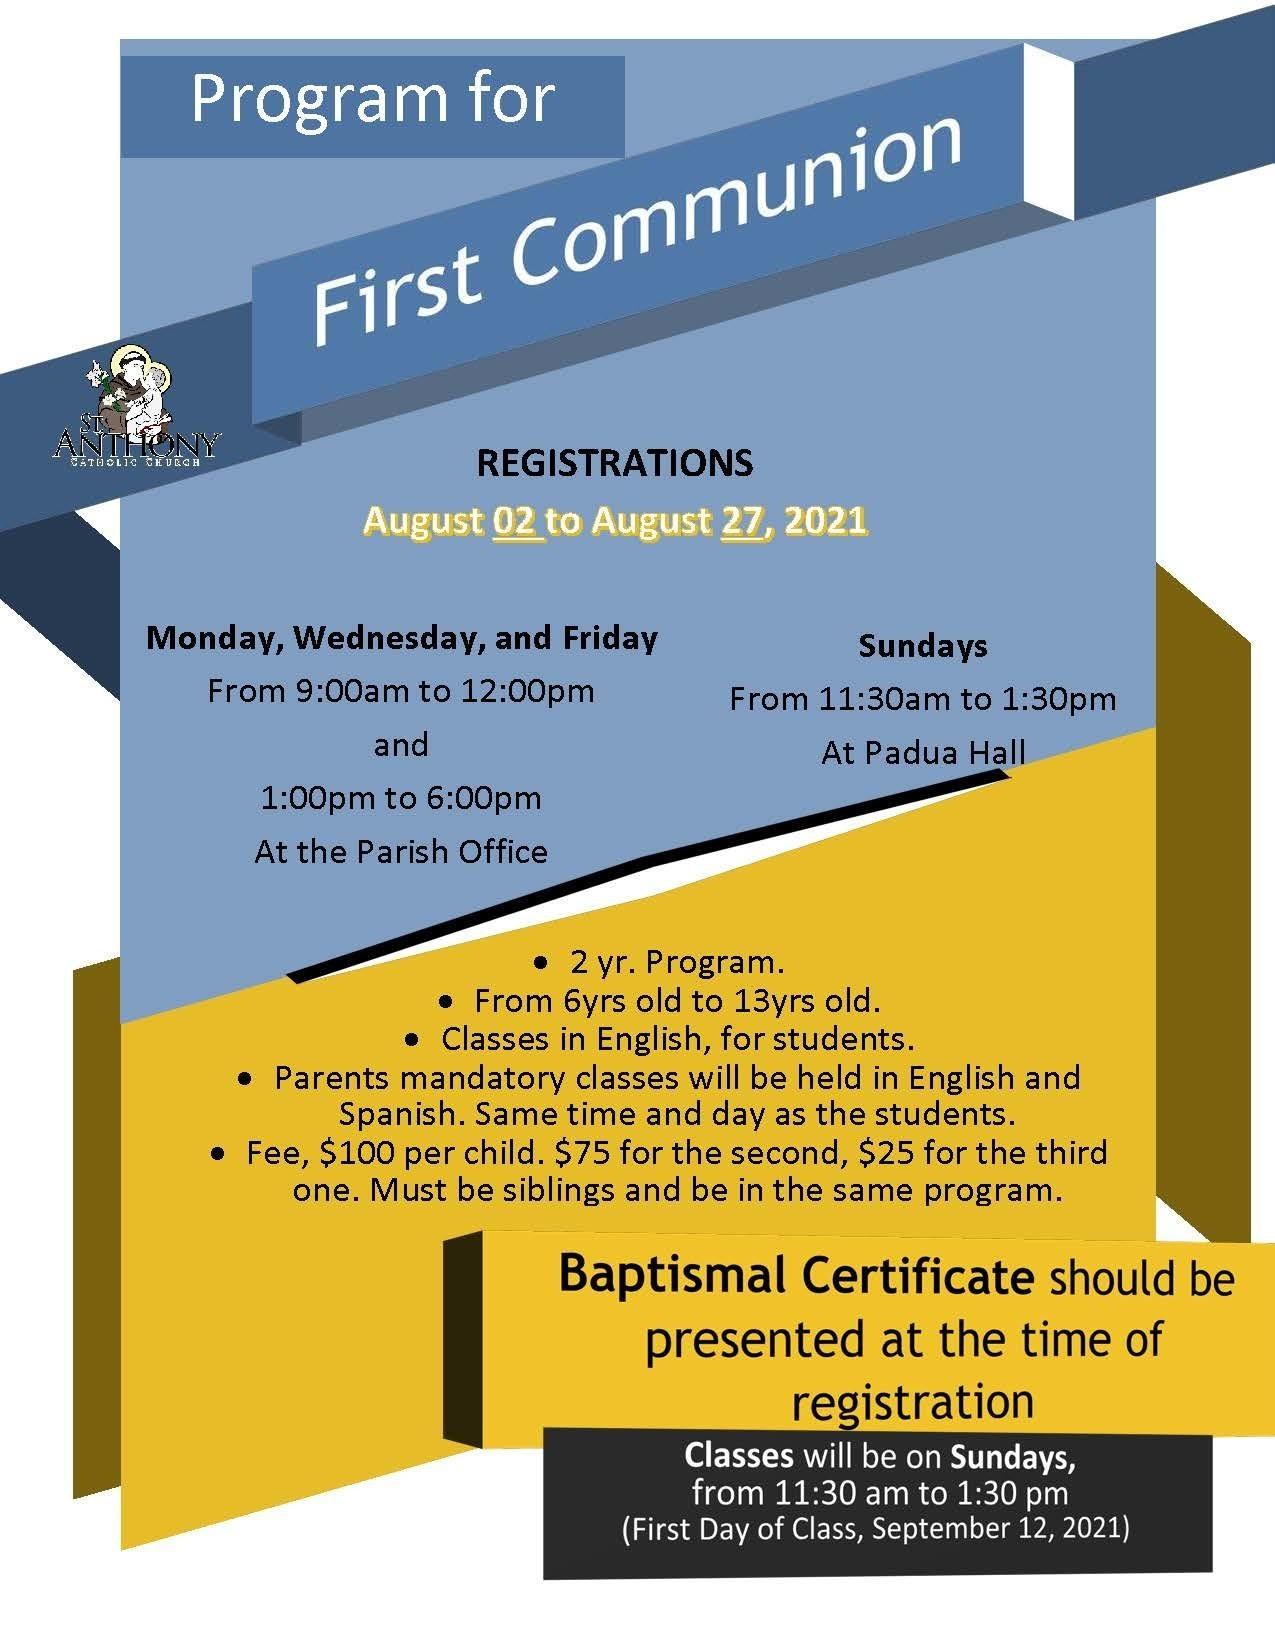 First Communion Program